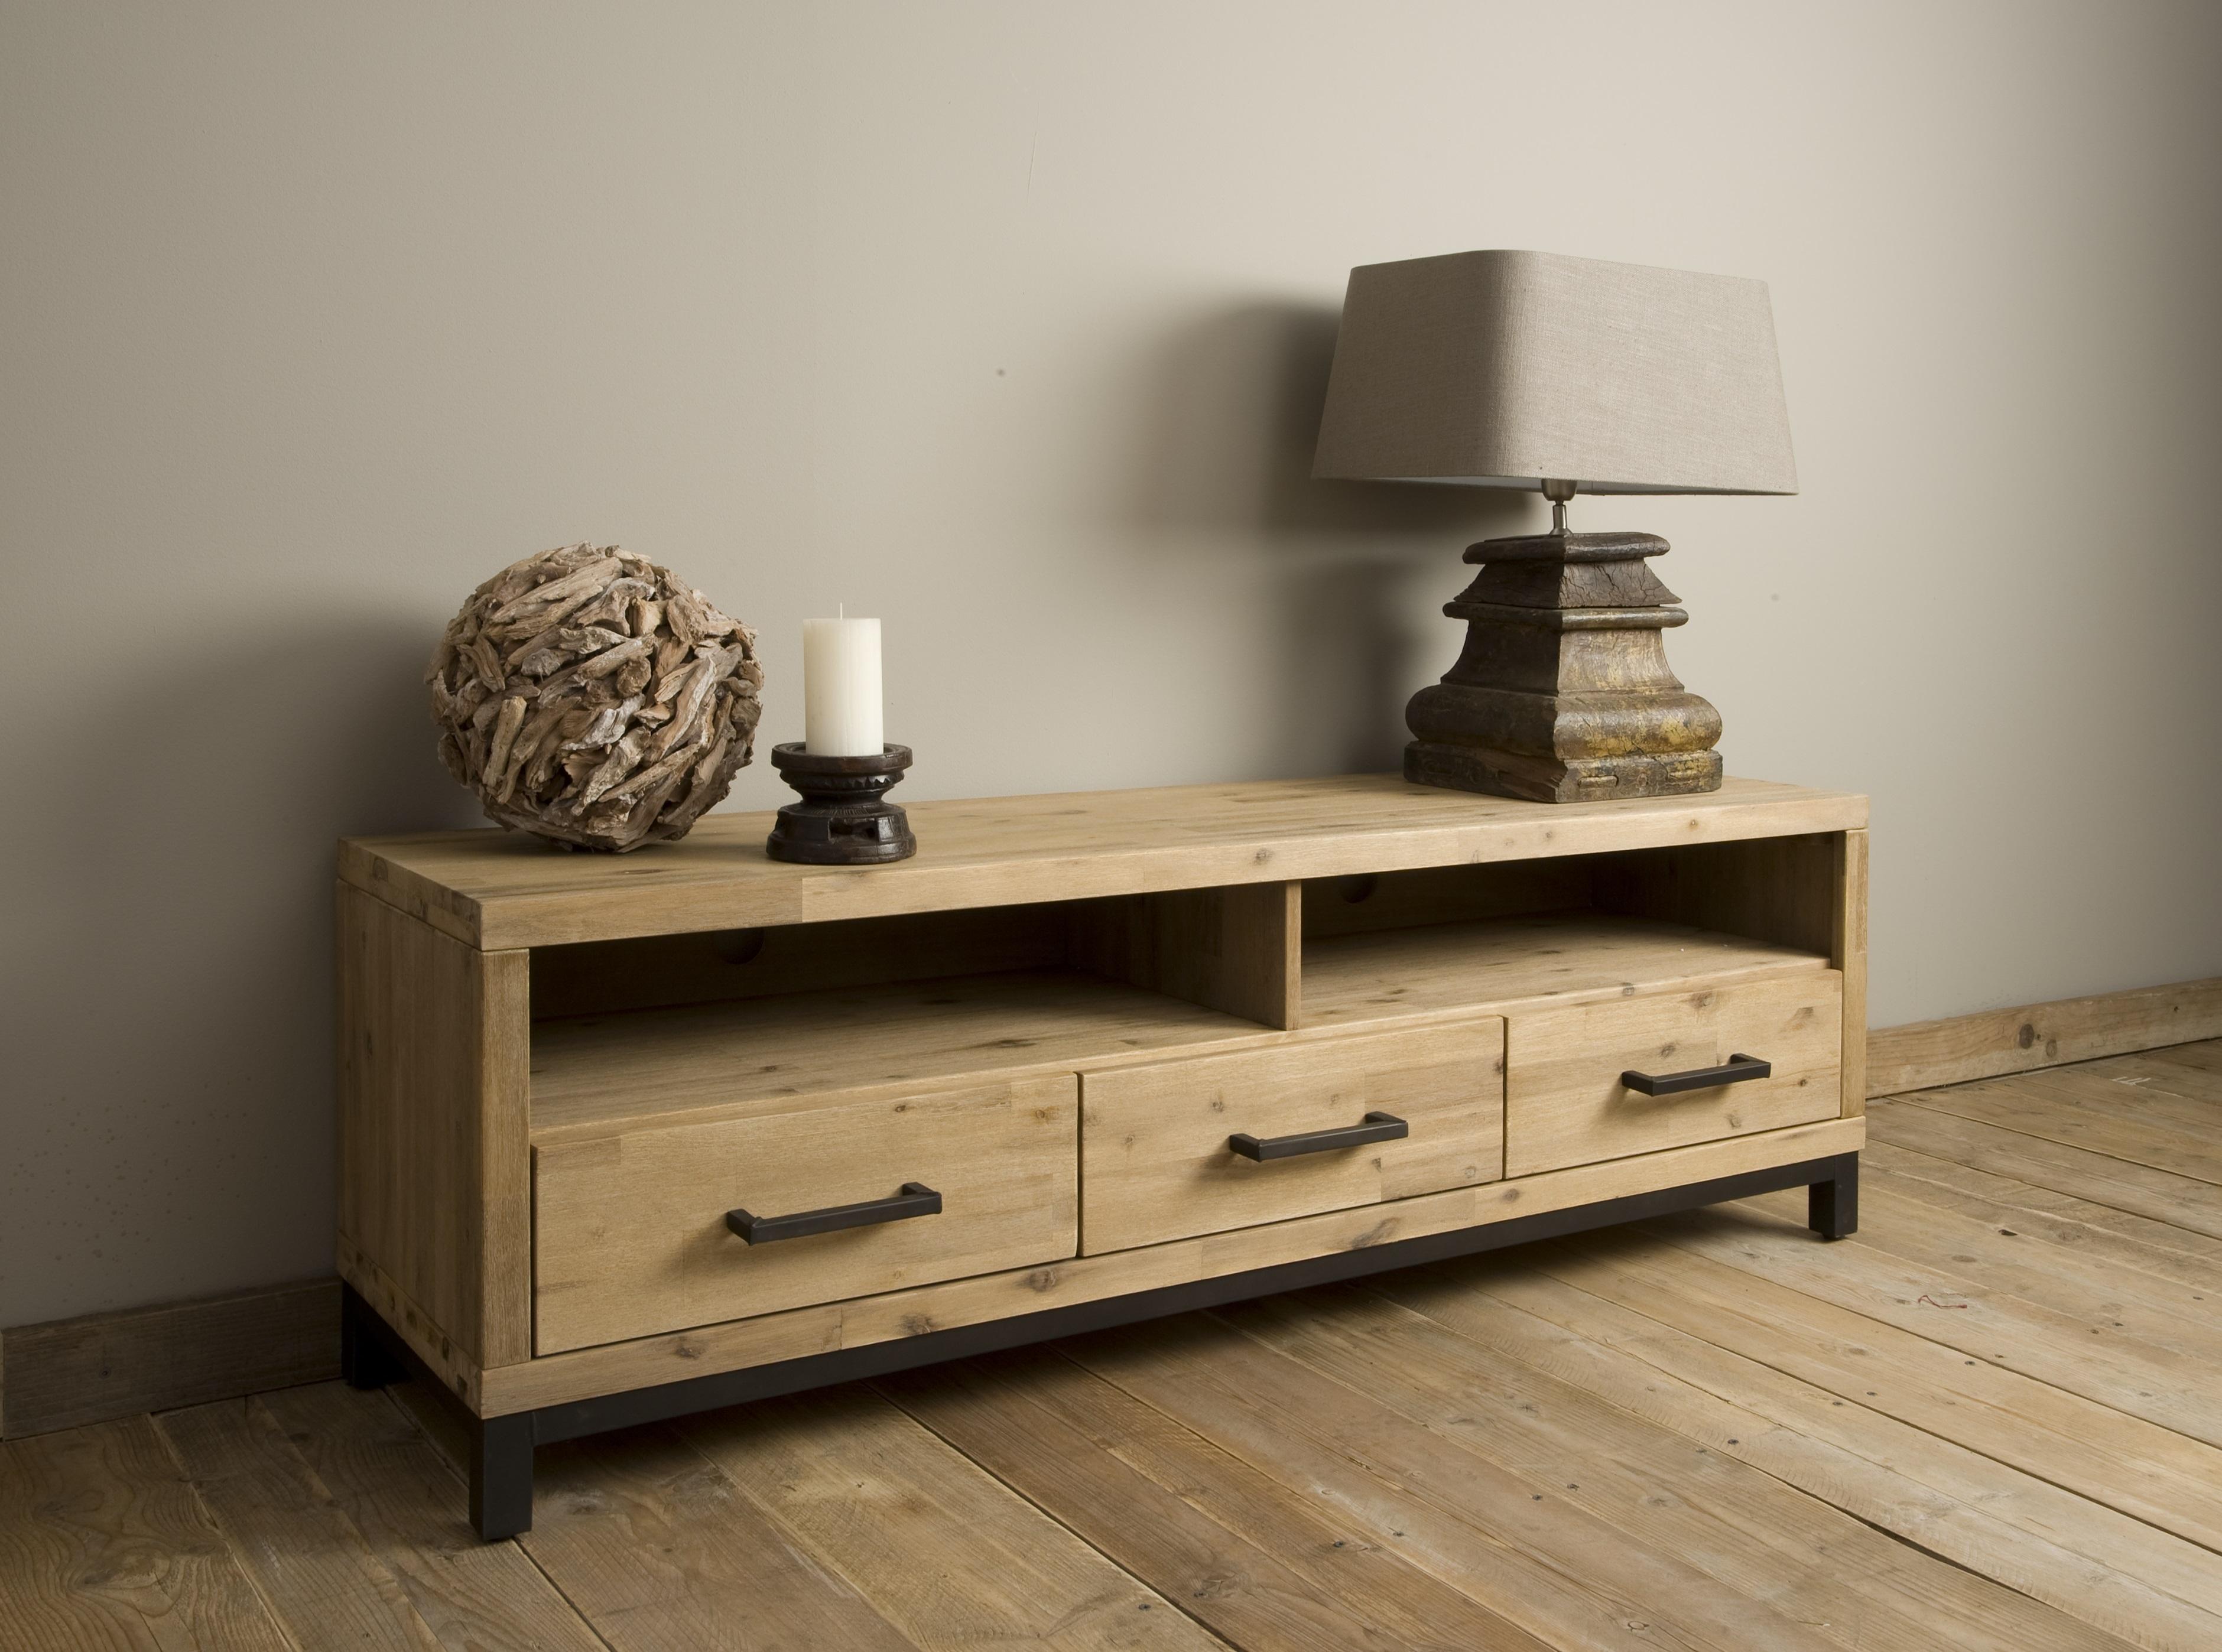 Markus john bolton tv meubel acasia industrieel 162 cm for Meubels industrieel